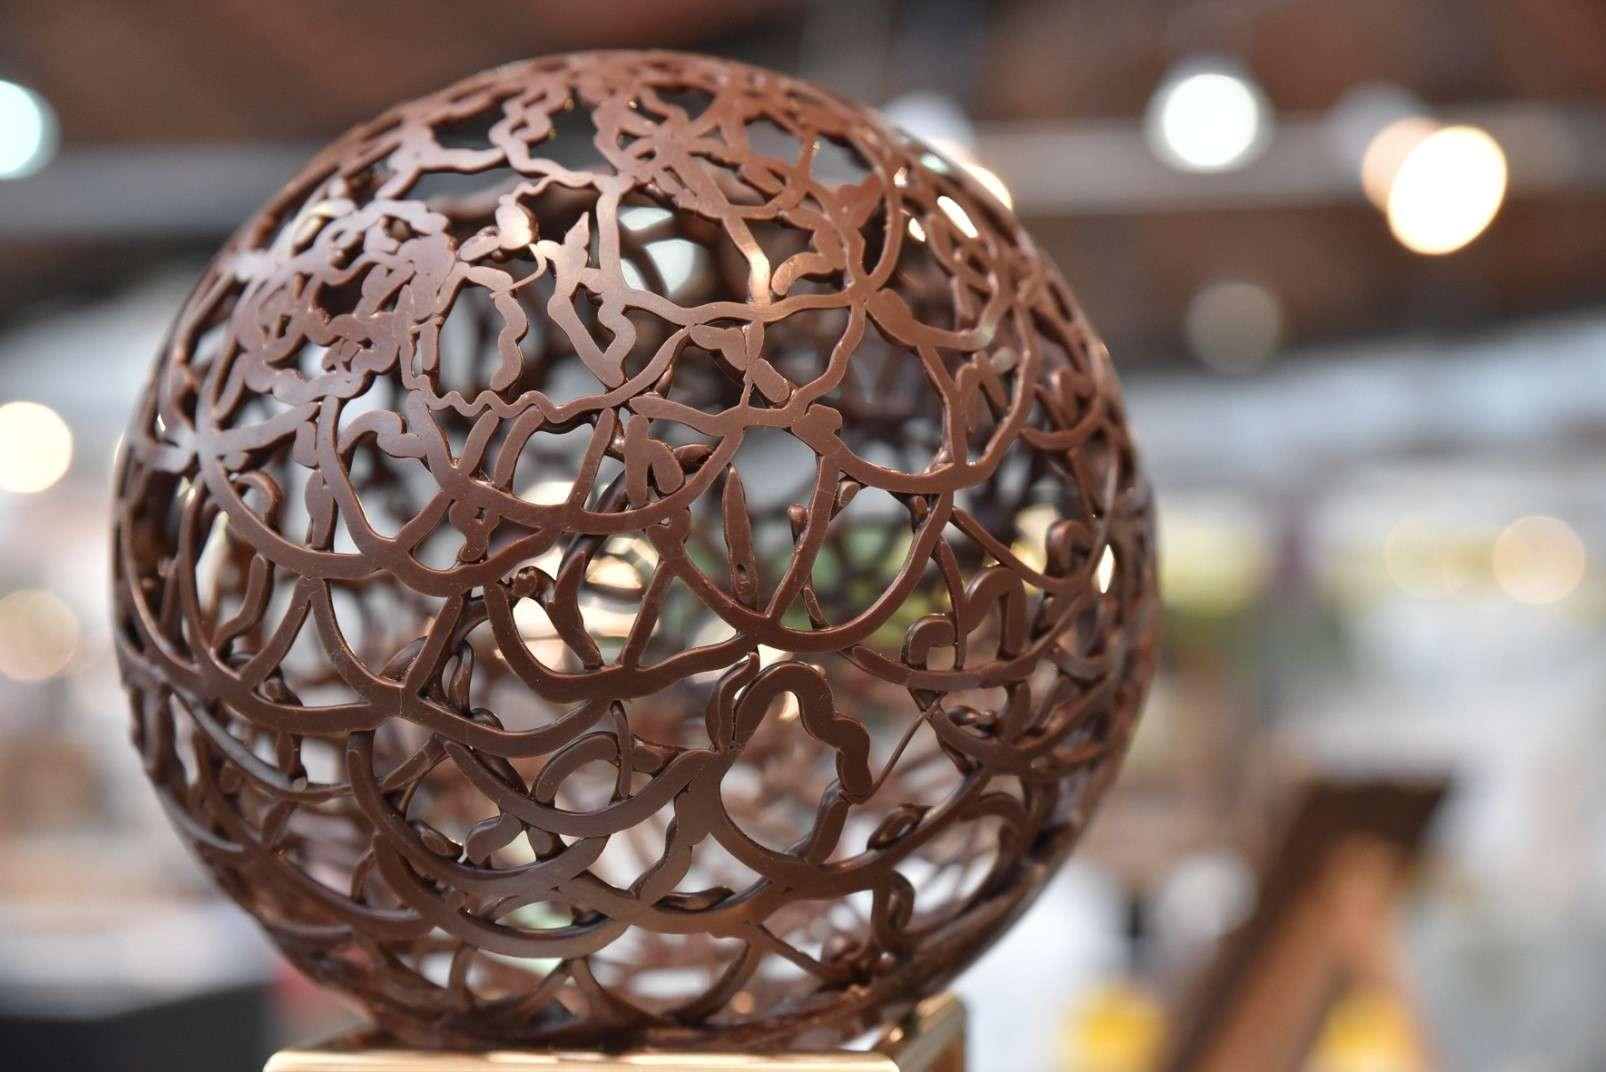 Salon du Chocolat - Brussels